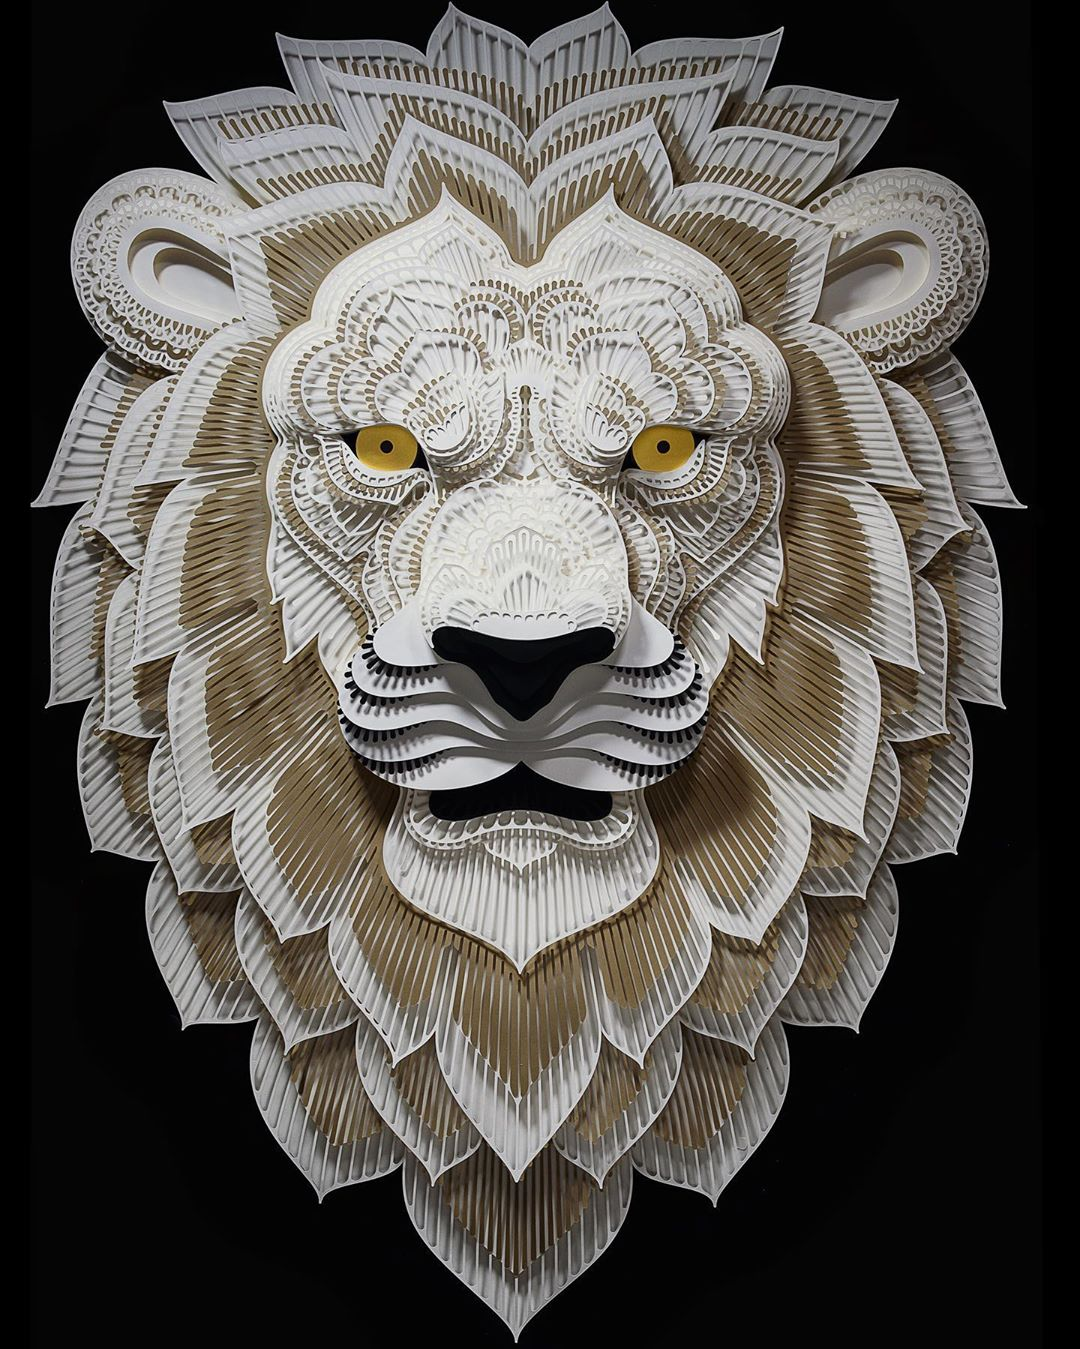 Filipino Sculptor Creates Public Awareness About Endangered Species Through Cut Paper Sculptures 2